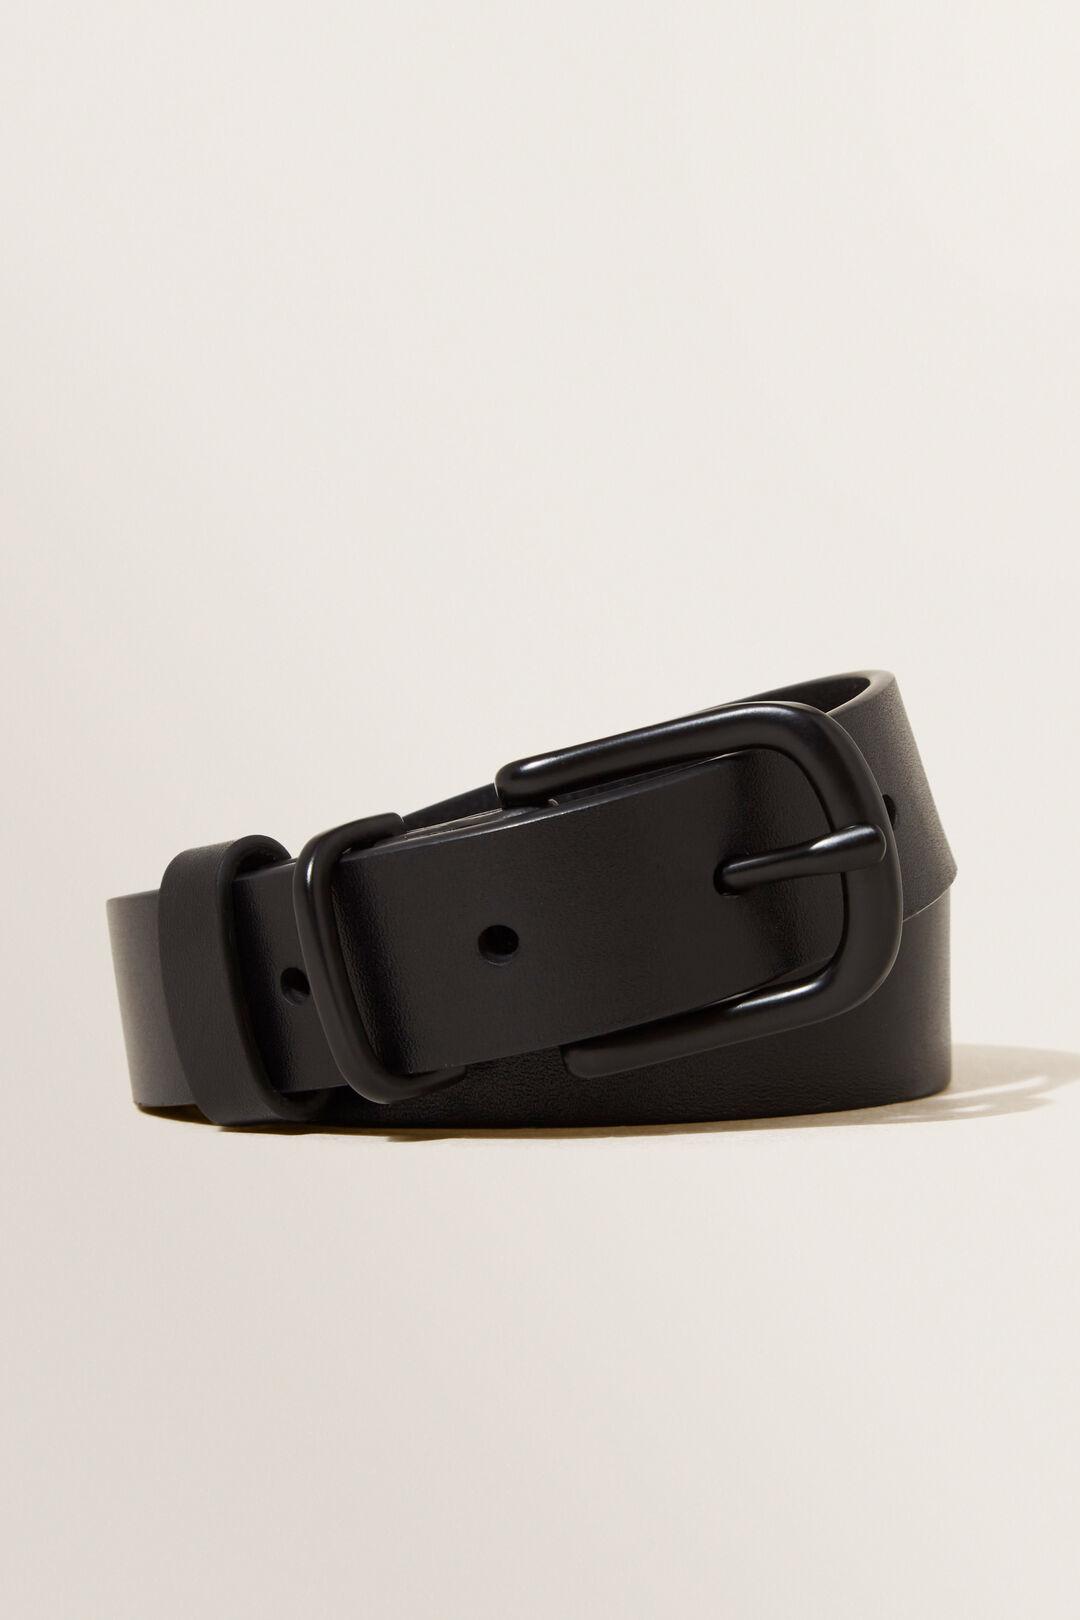 Classic Leather Belt  BLACK / BLACK  hi-res